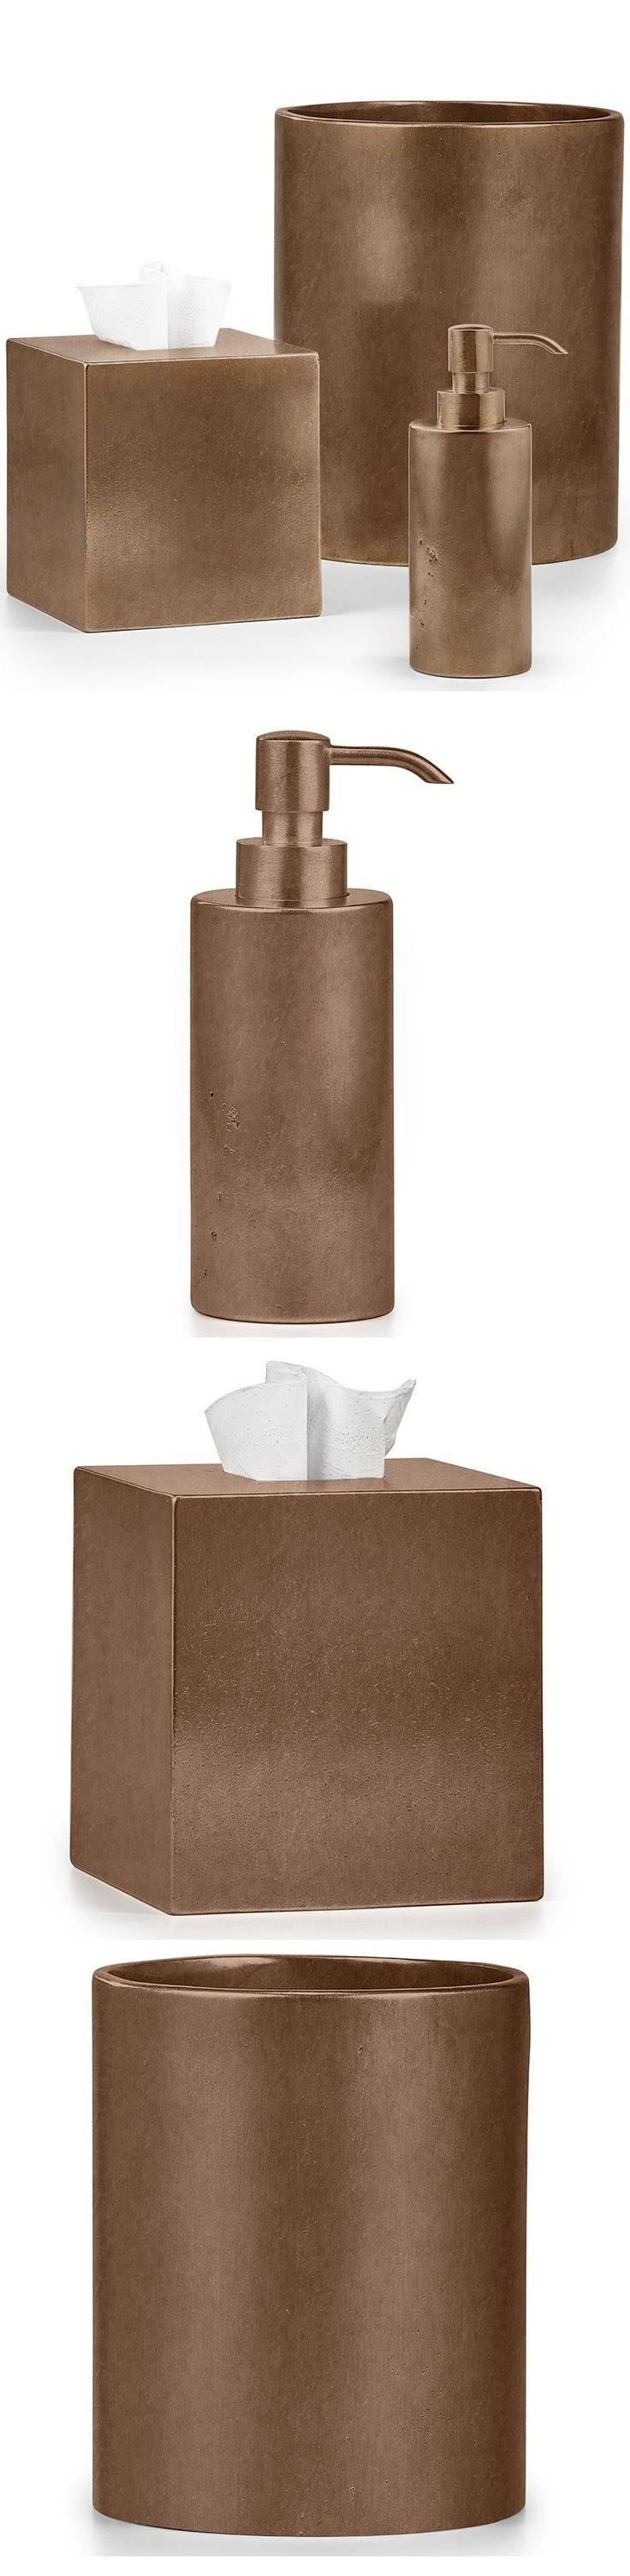 accessory gorgeous sets piece ideas designer pinterest bath design fancy albury best accessories set bathroom on